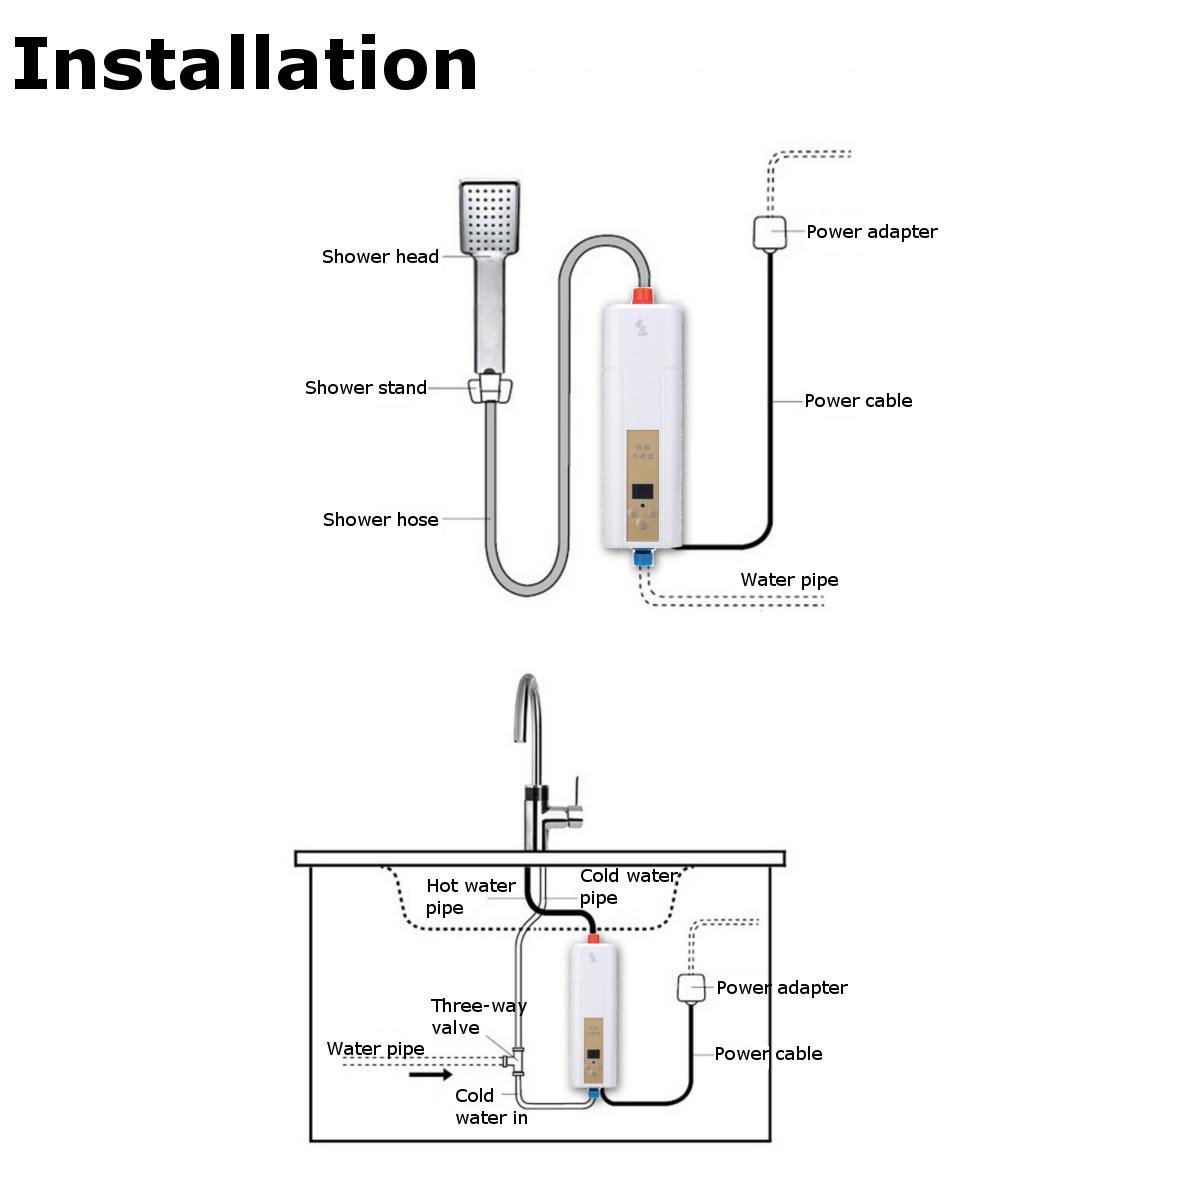 Ford 8340 Wiring Diagram